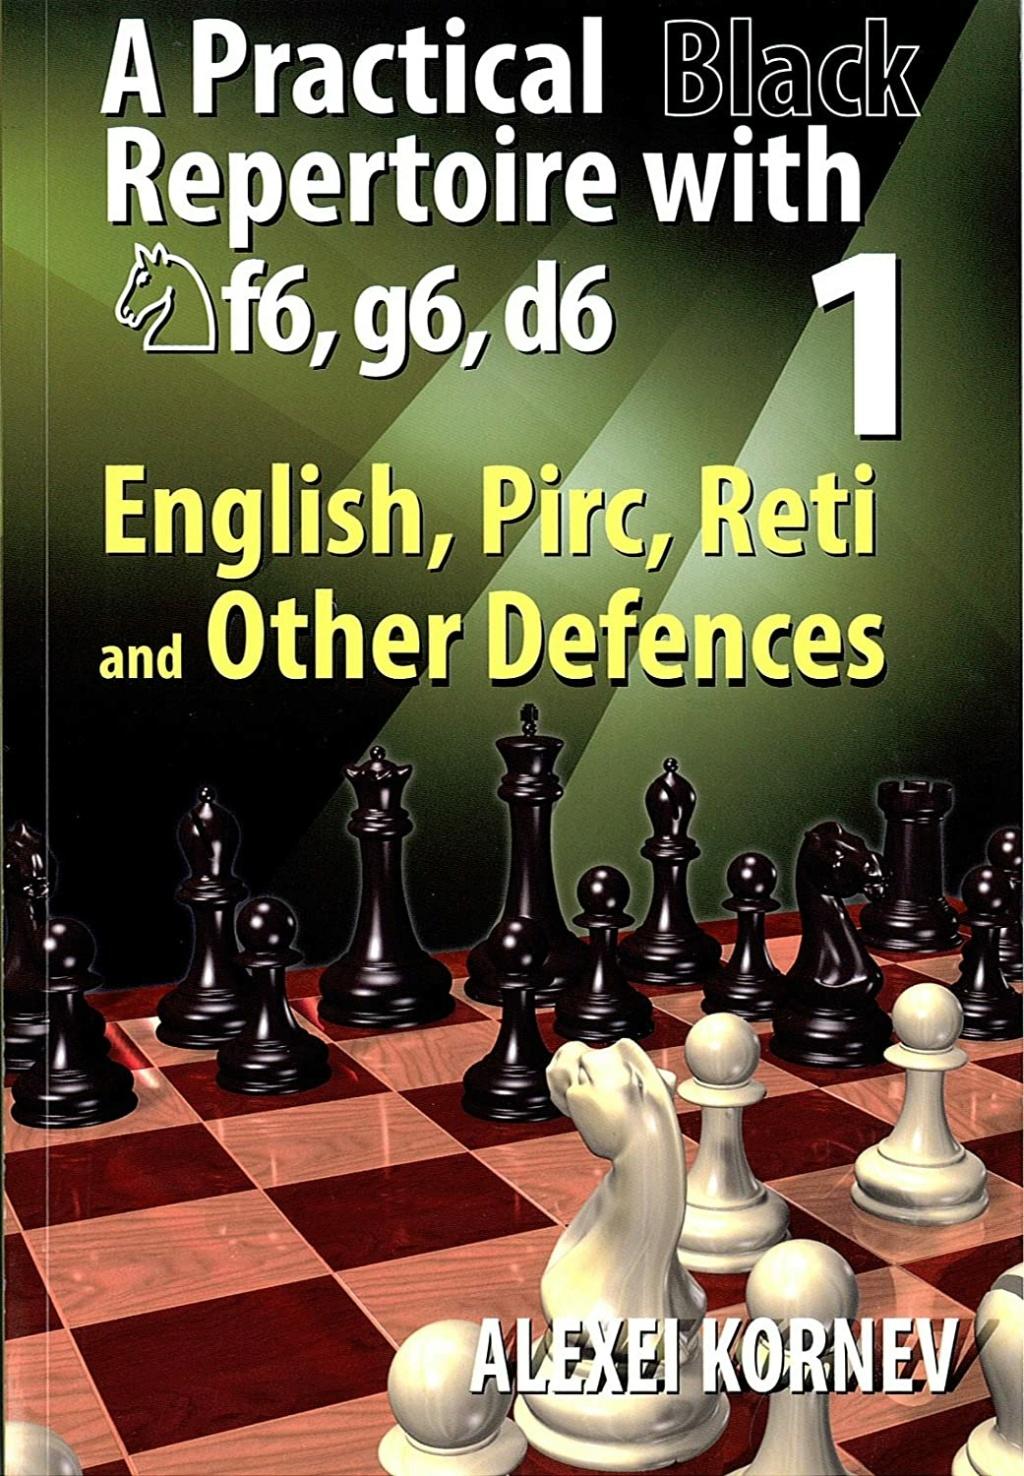 Alexei Kornev_Practical Black Repertoir wit d5,c6 V.1 PDF+PGN 110